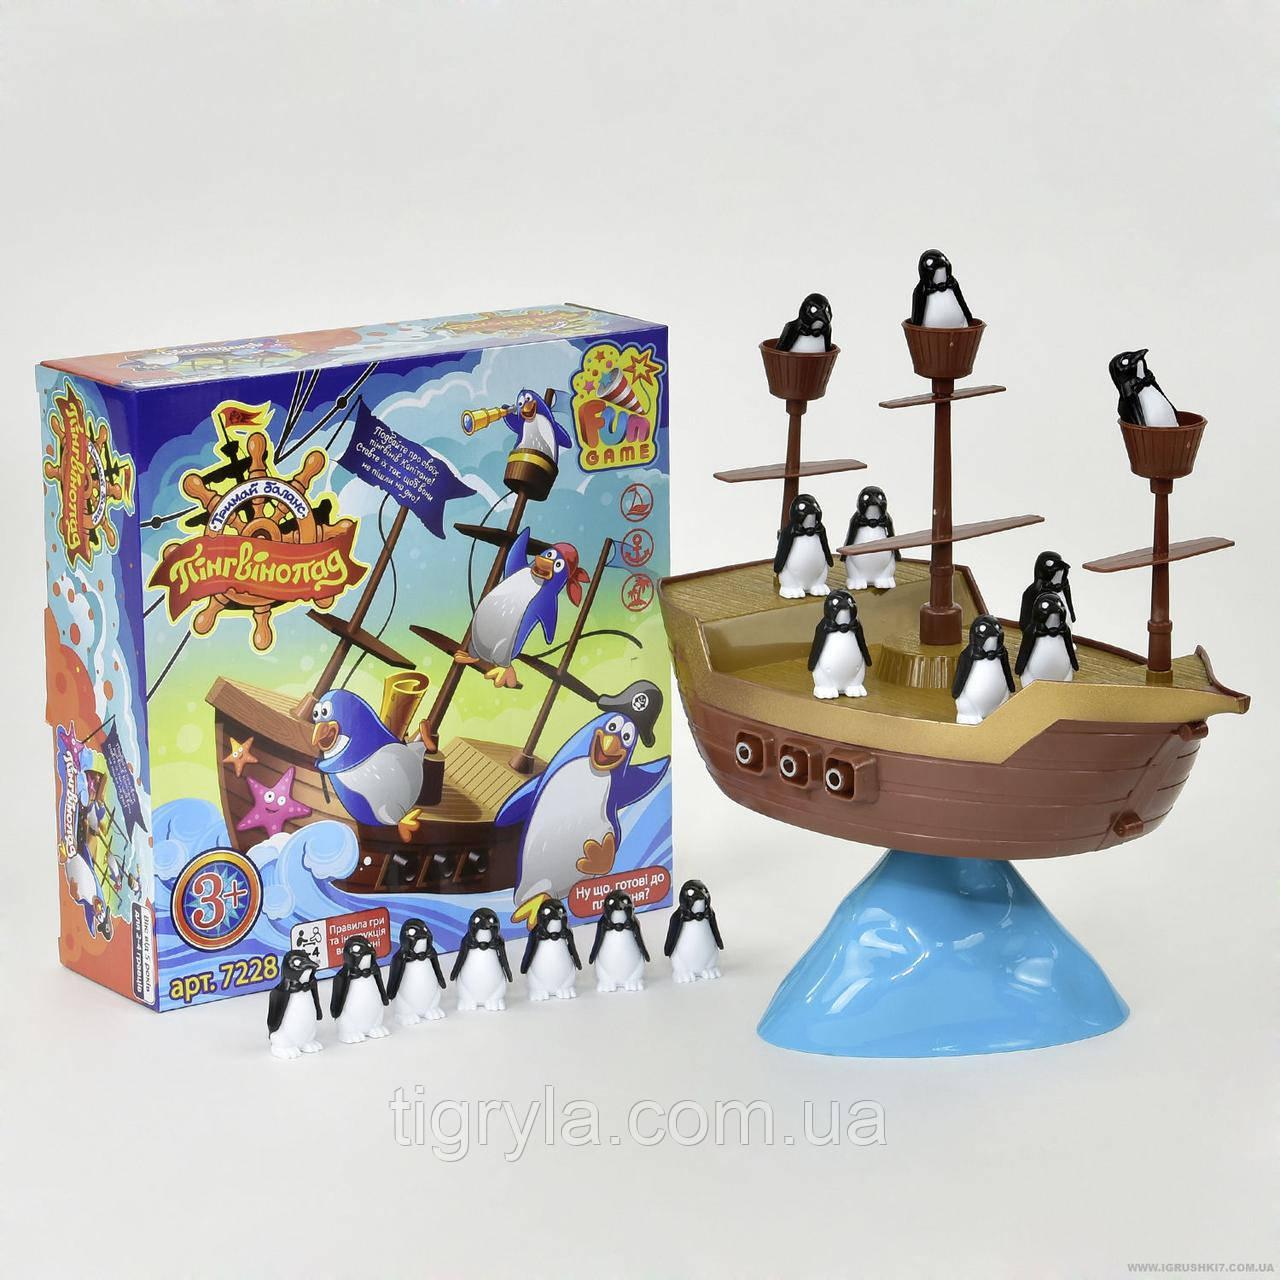 "Настольная игра балансир ""Пінгвінопад"". Держи баланс Пингвинопад"